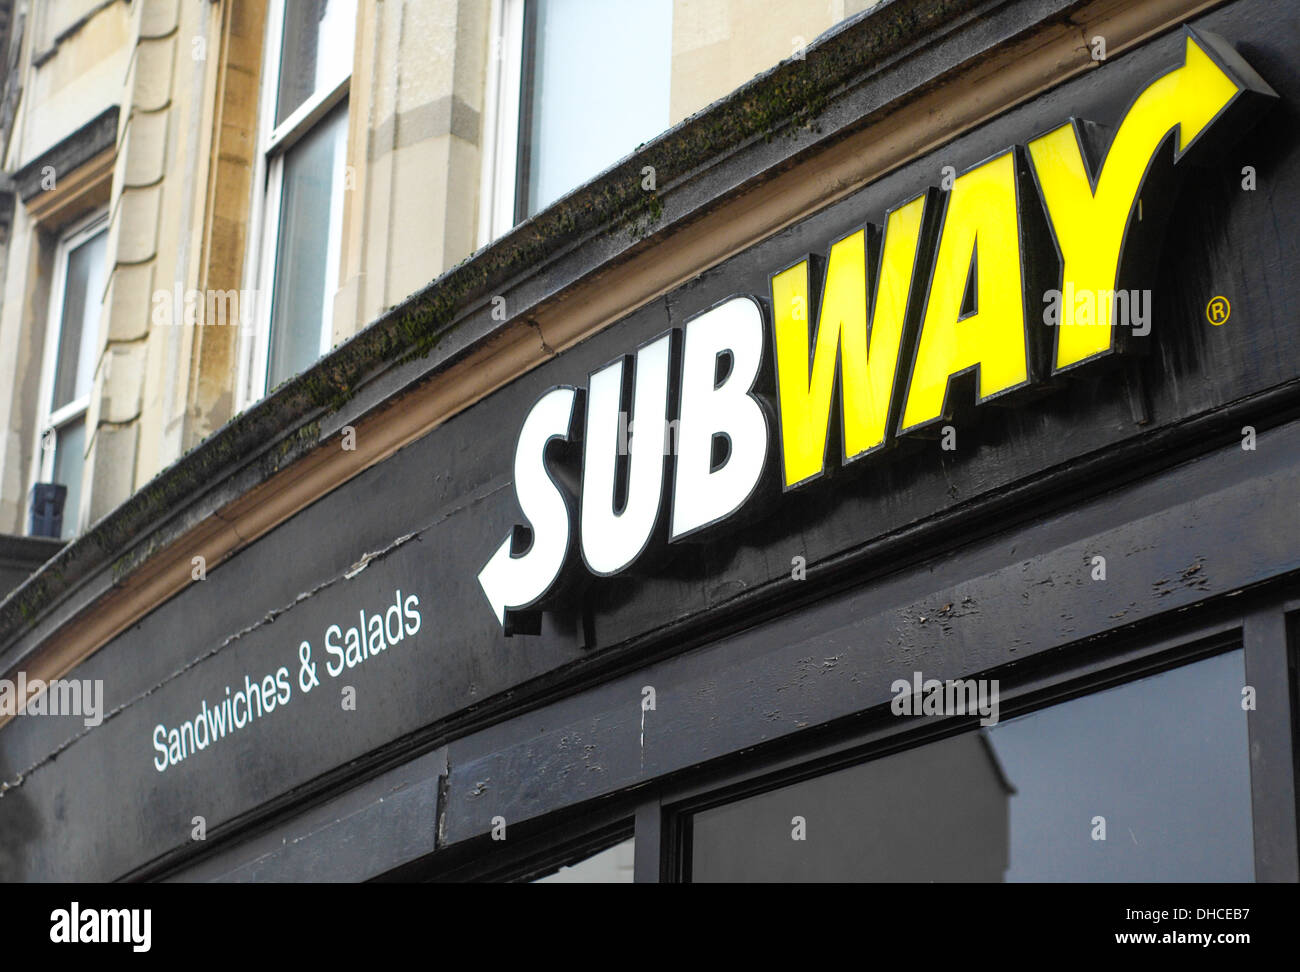 Subway sandwiche Salad shop - Stock Image